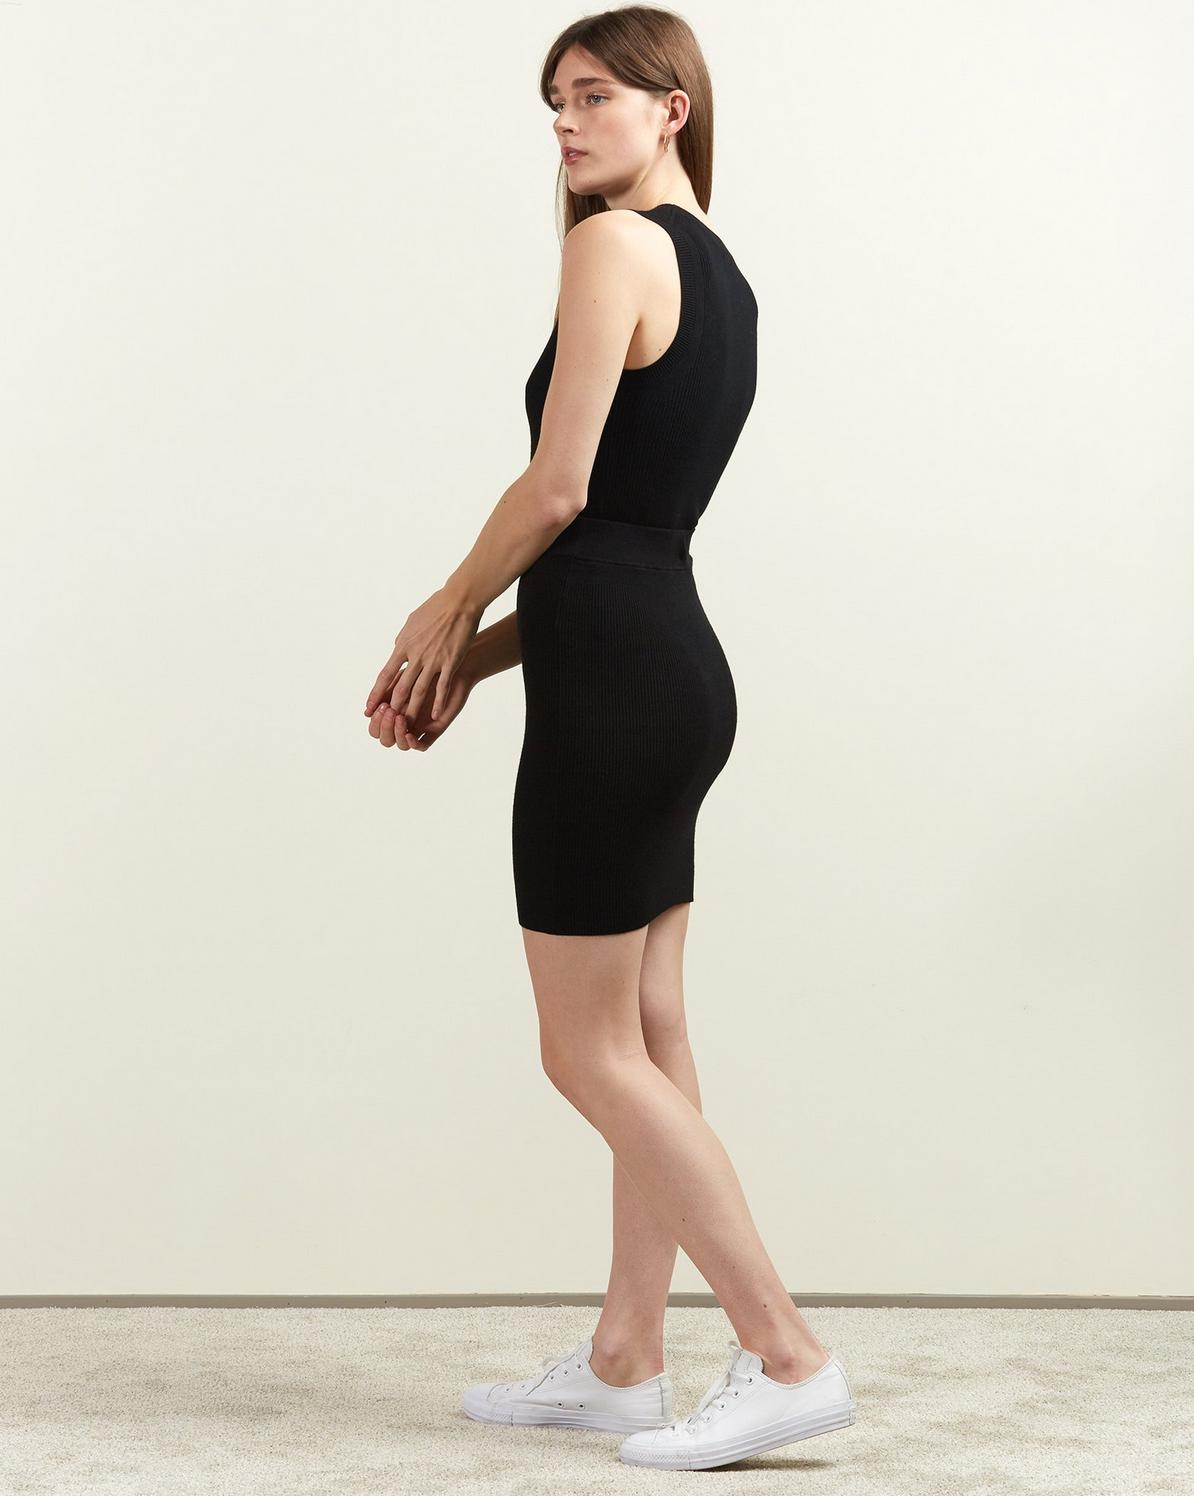 M//C Vadnais Skirt